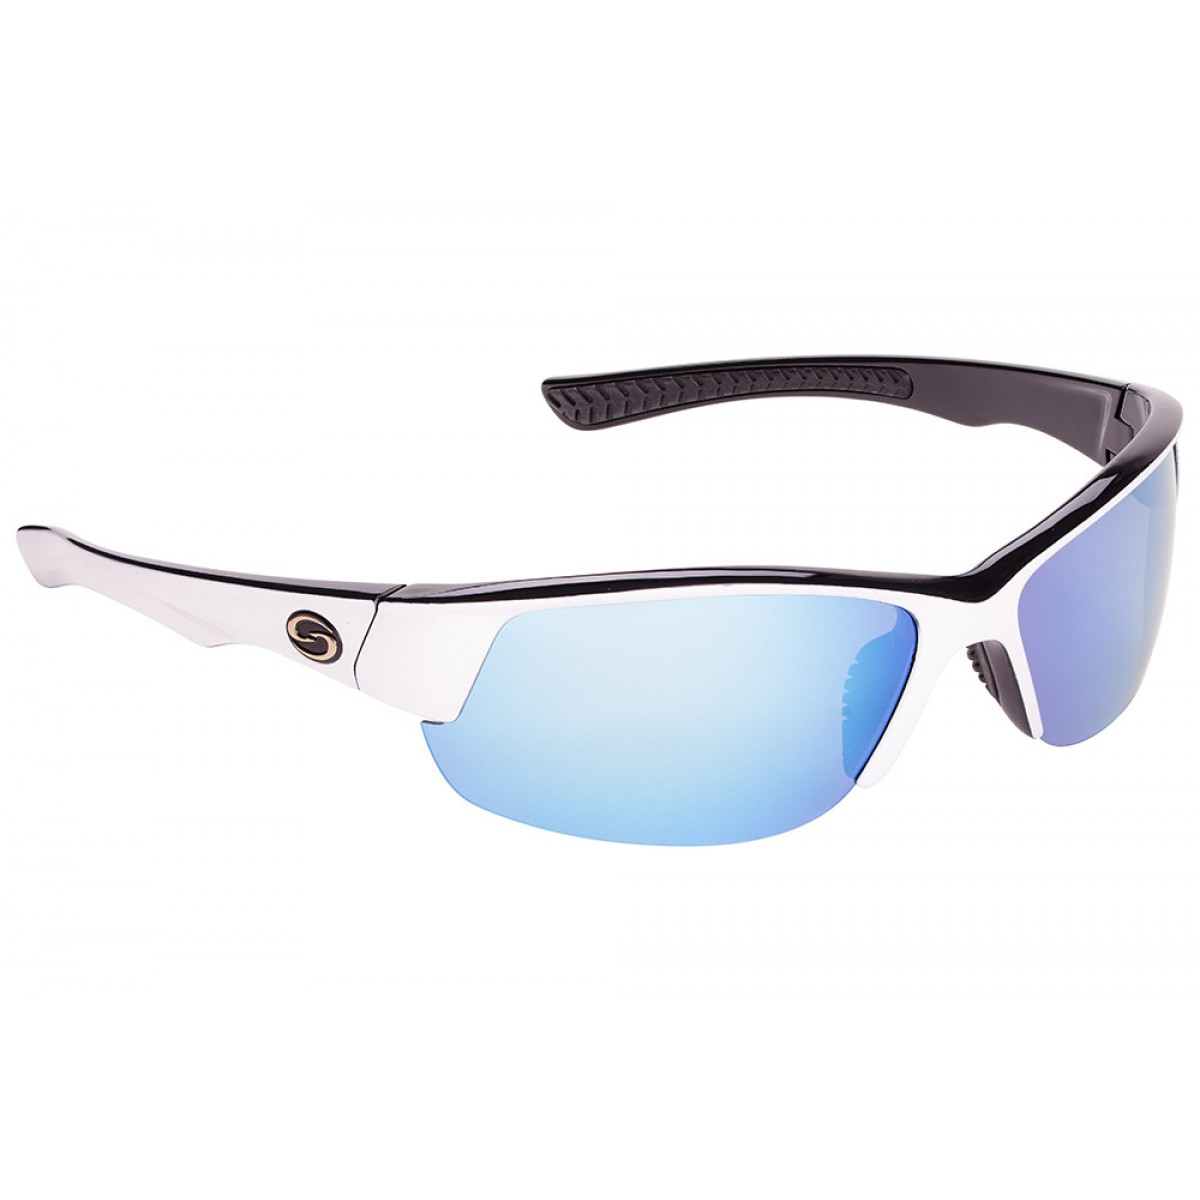 325db86b62 Strike King S11 Sunglasses